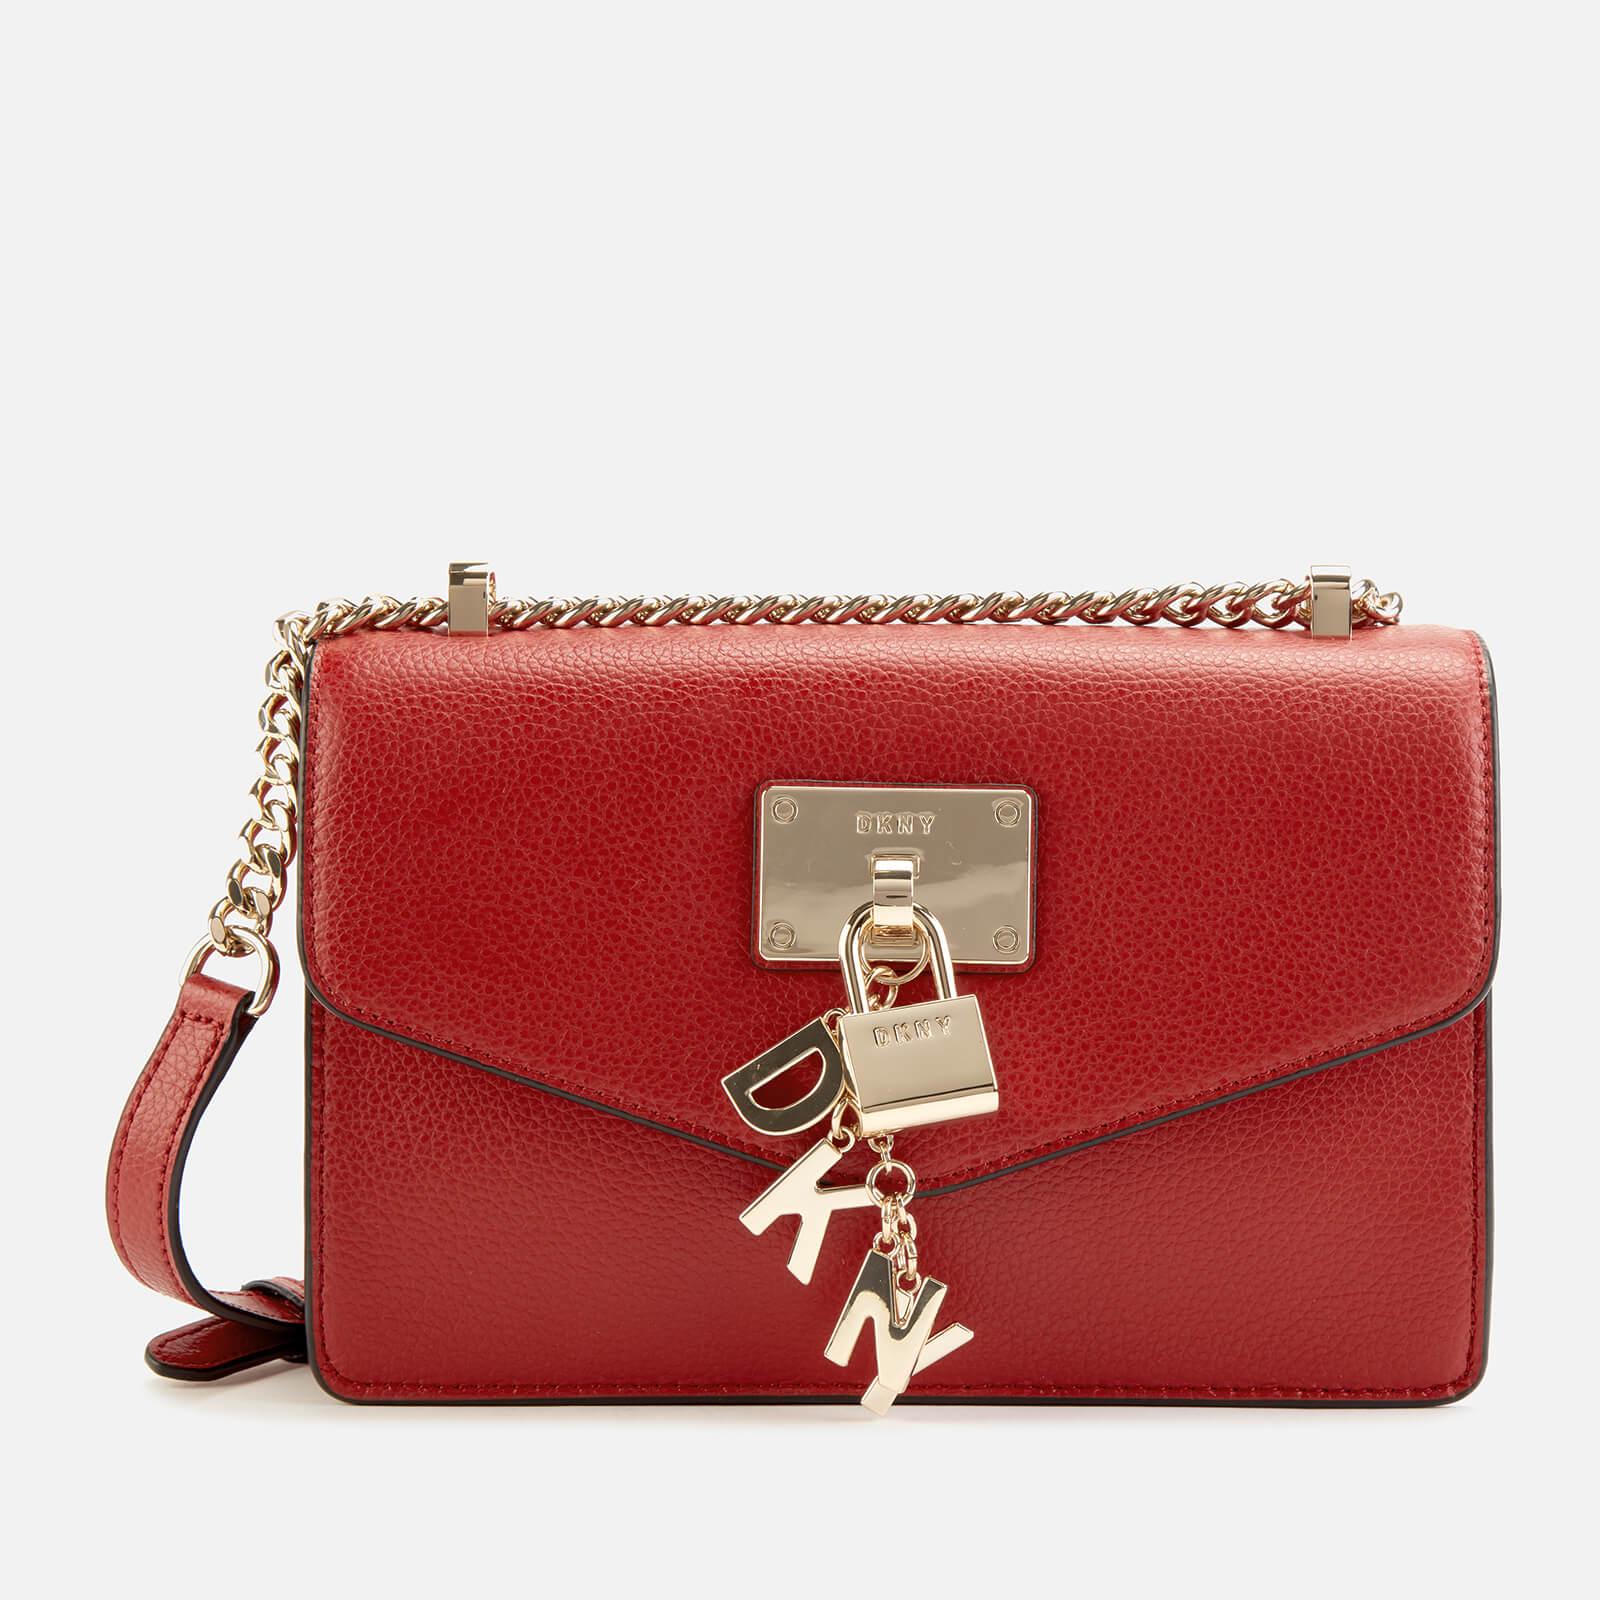 DKNY Women's Elissa Small Shoulder Flap Bag - Bright Red